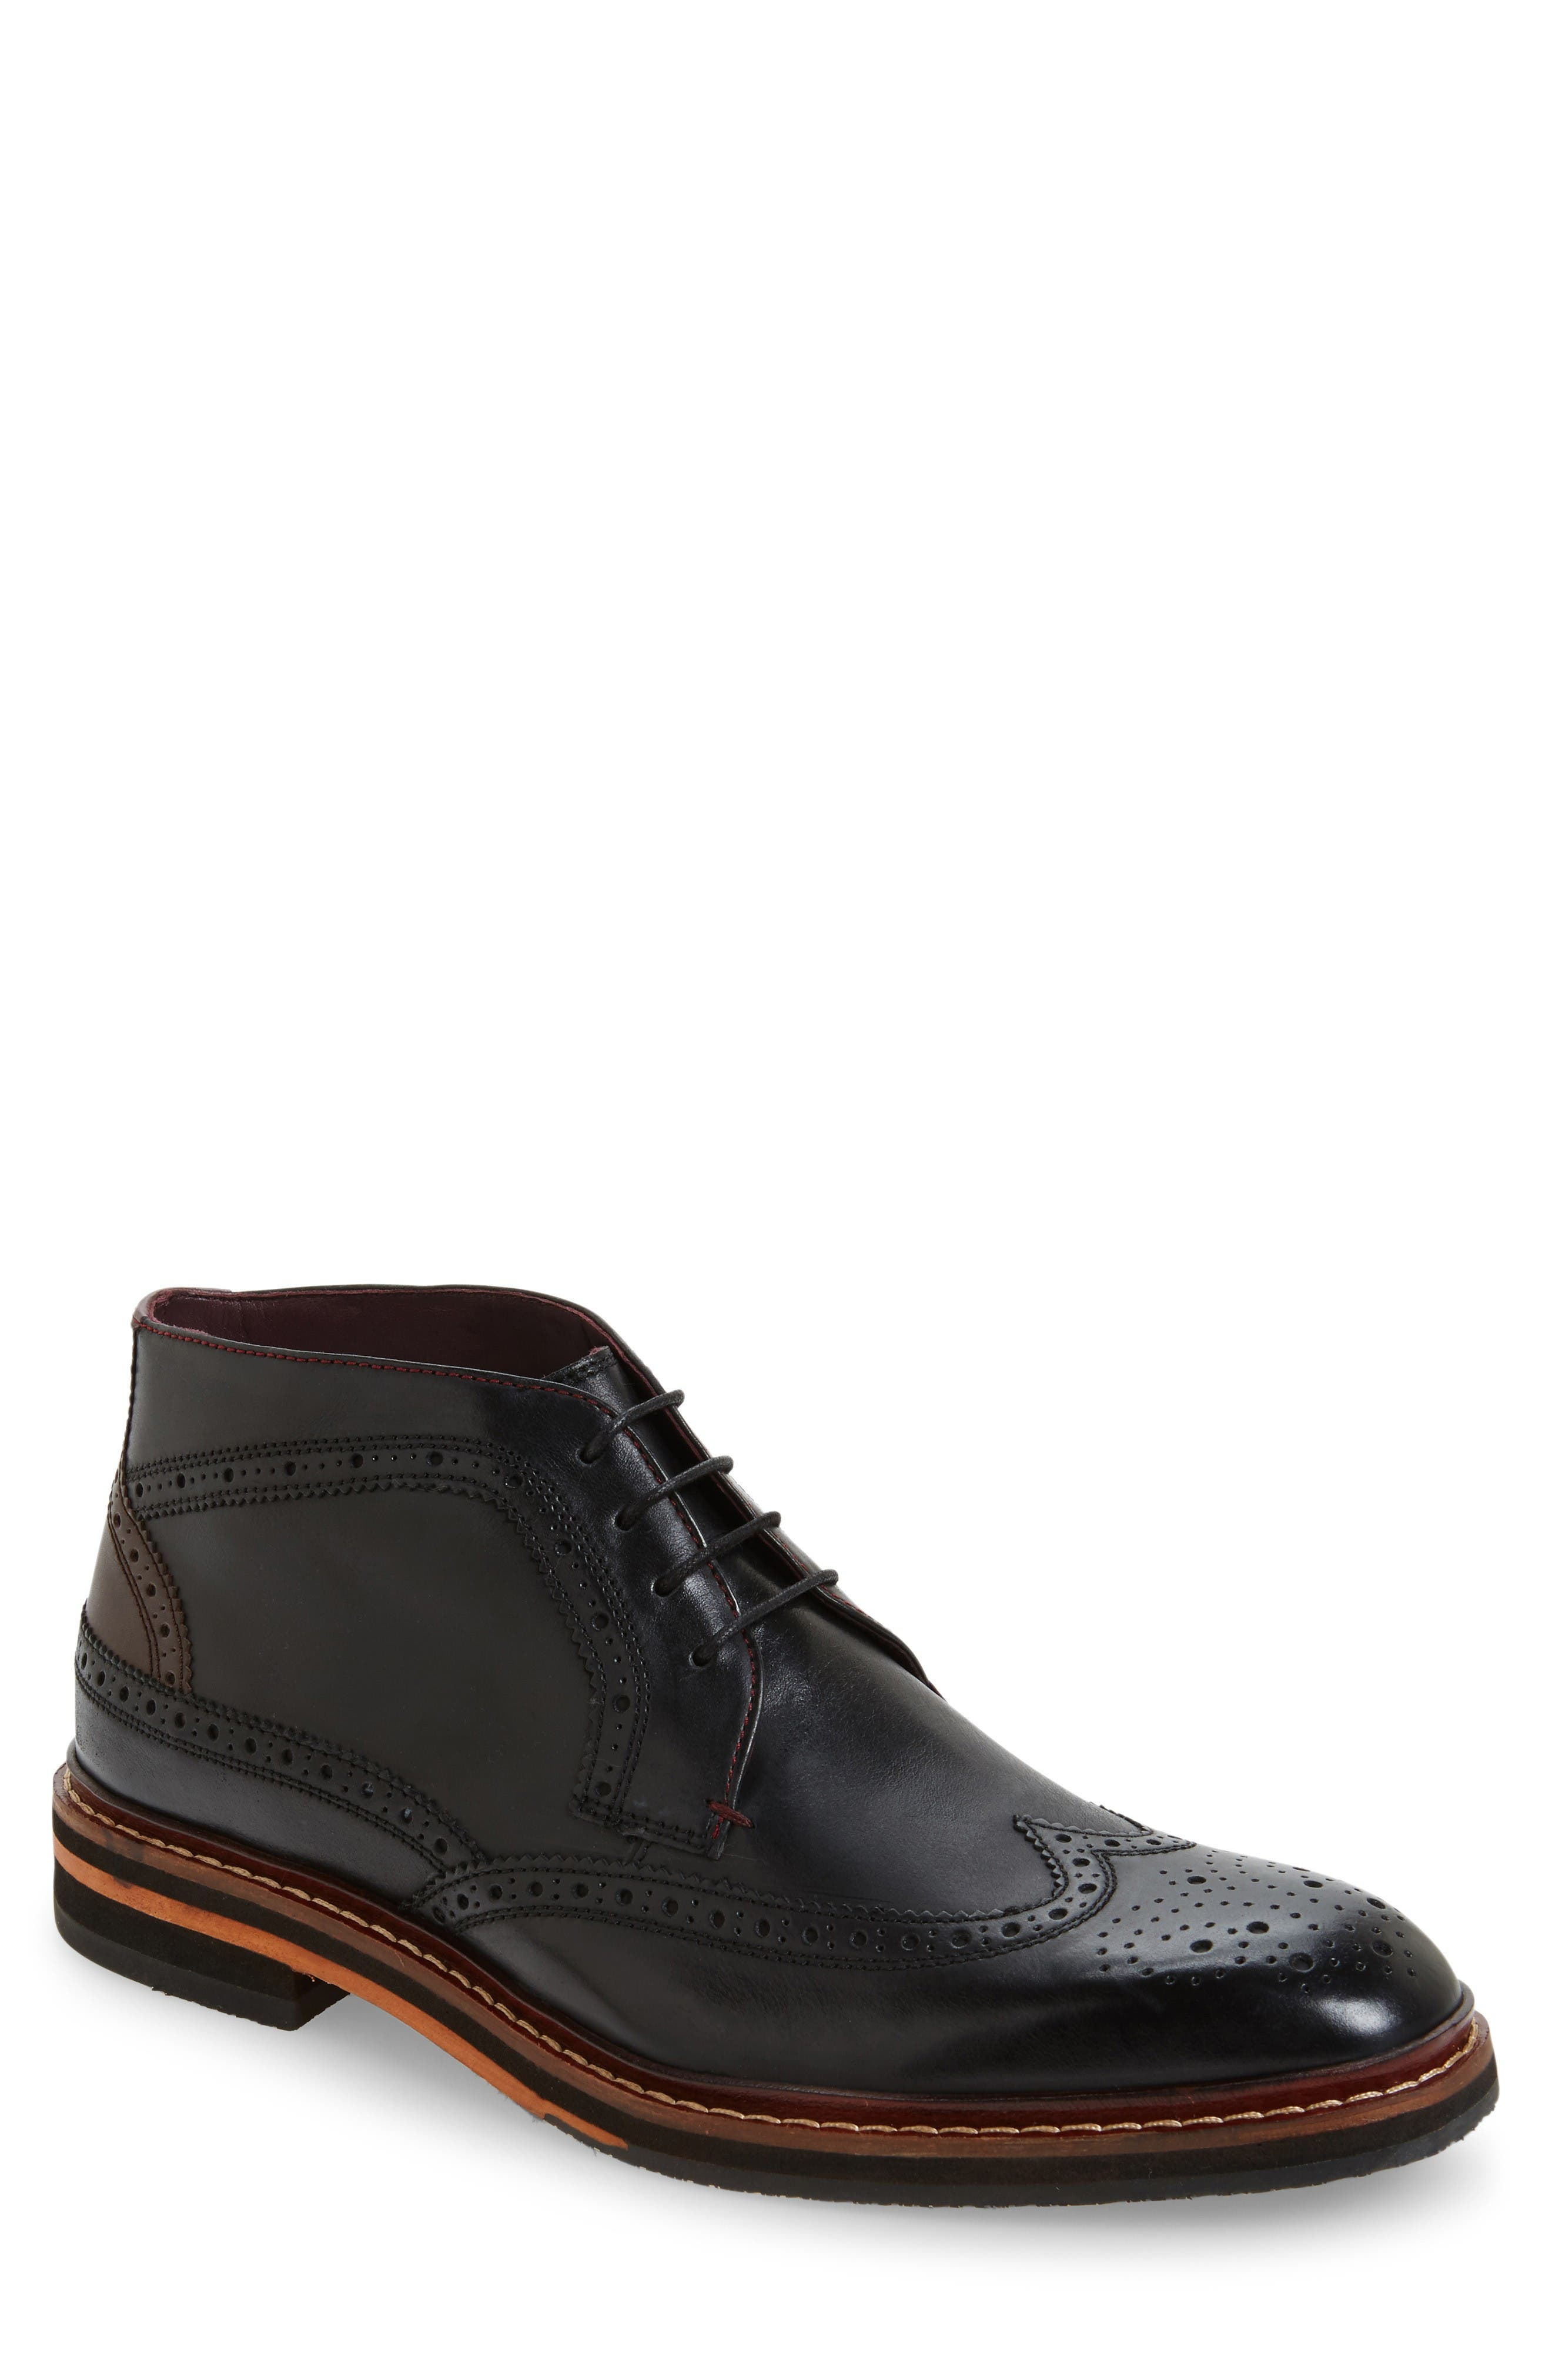 Alternate Image 1 Selected - Ted Baker London Cinika Wingtip Chukka Boot (Men)